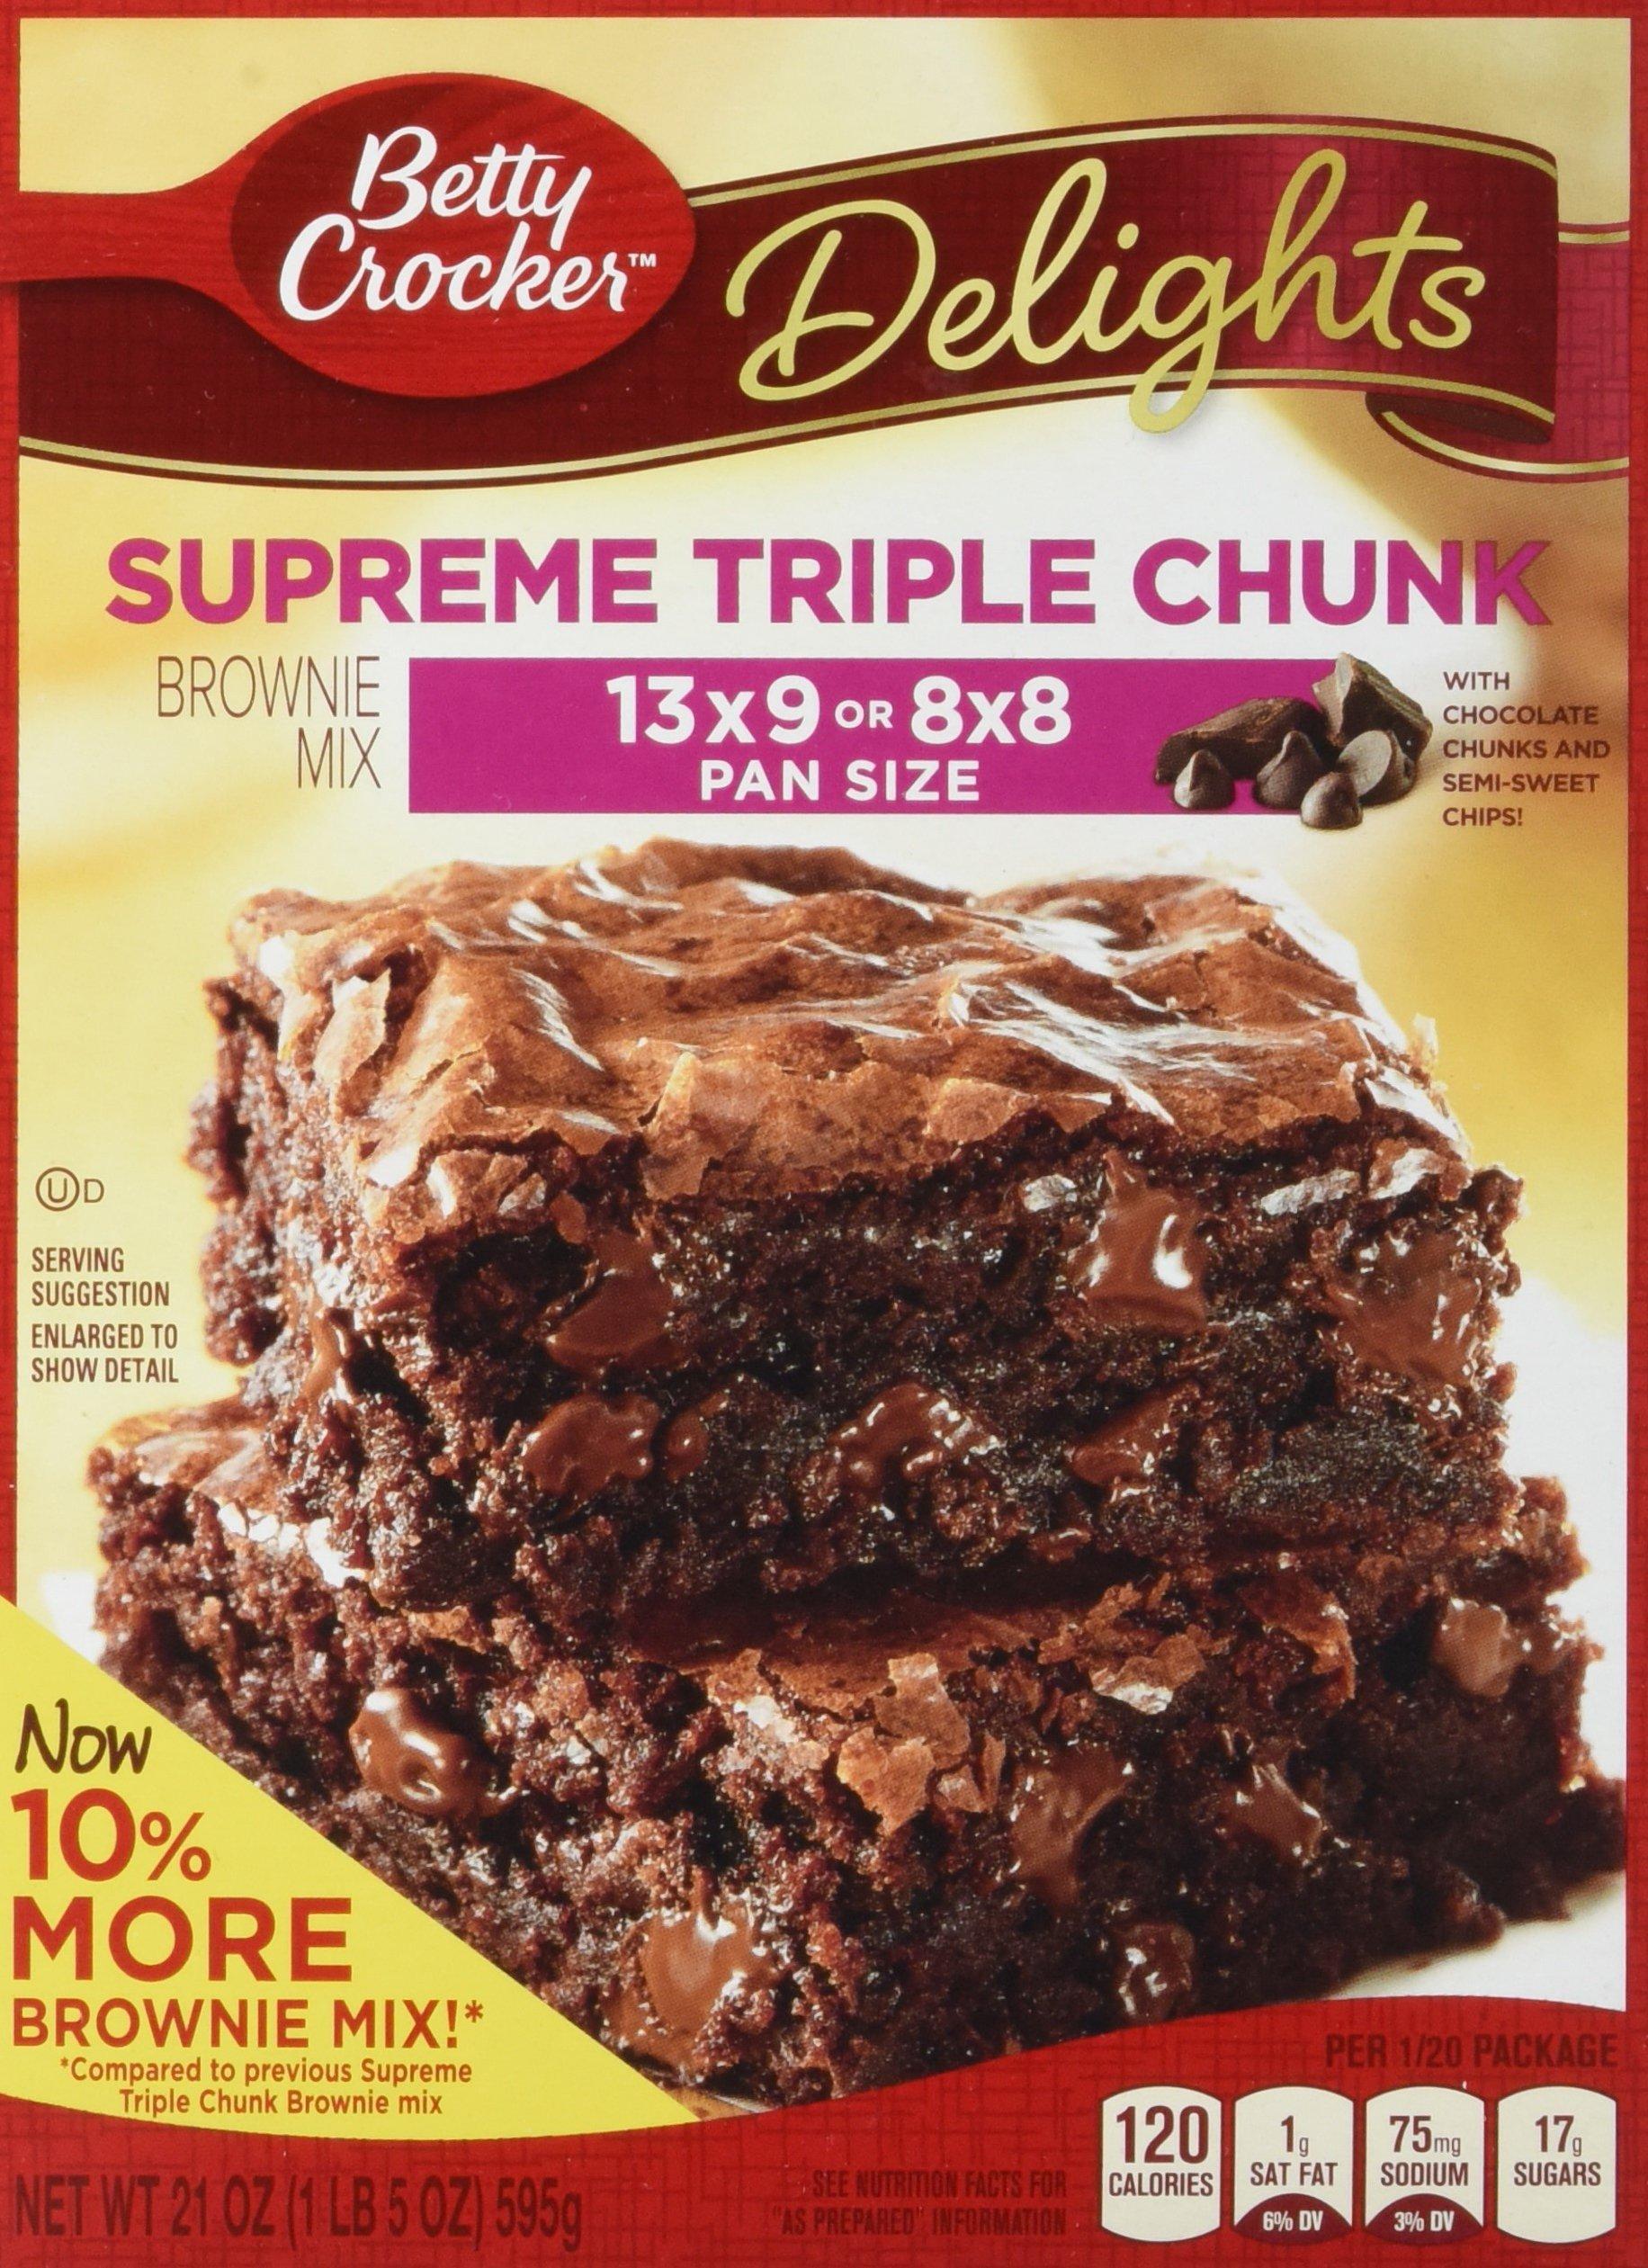 Betty Crocker Delights, Supreme Triple Chunk Brownie Mix, 21 Oz Box (Pack of 8)